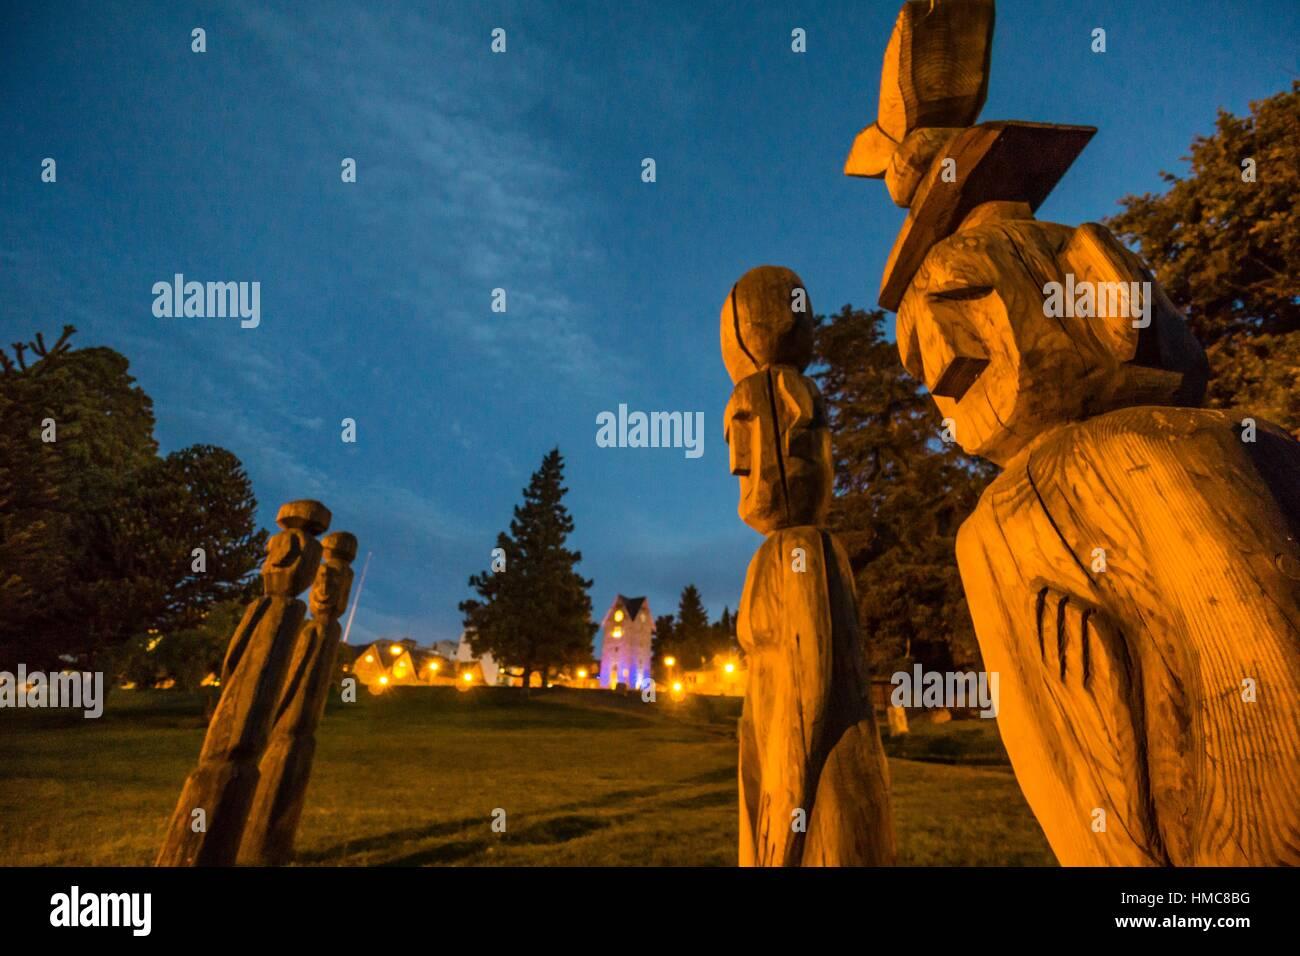 ´Chemamull´ carved wooden statues by Bernardo Oyarzún, San Carlos de Bariloche, Río Negro, Patagonia, - Stock Image